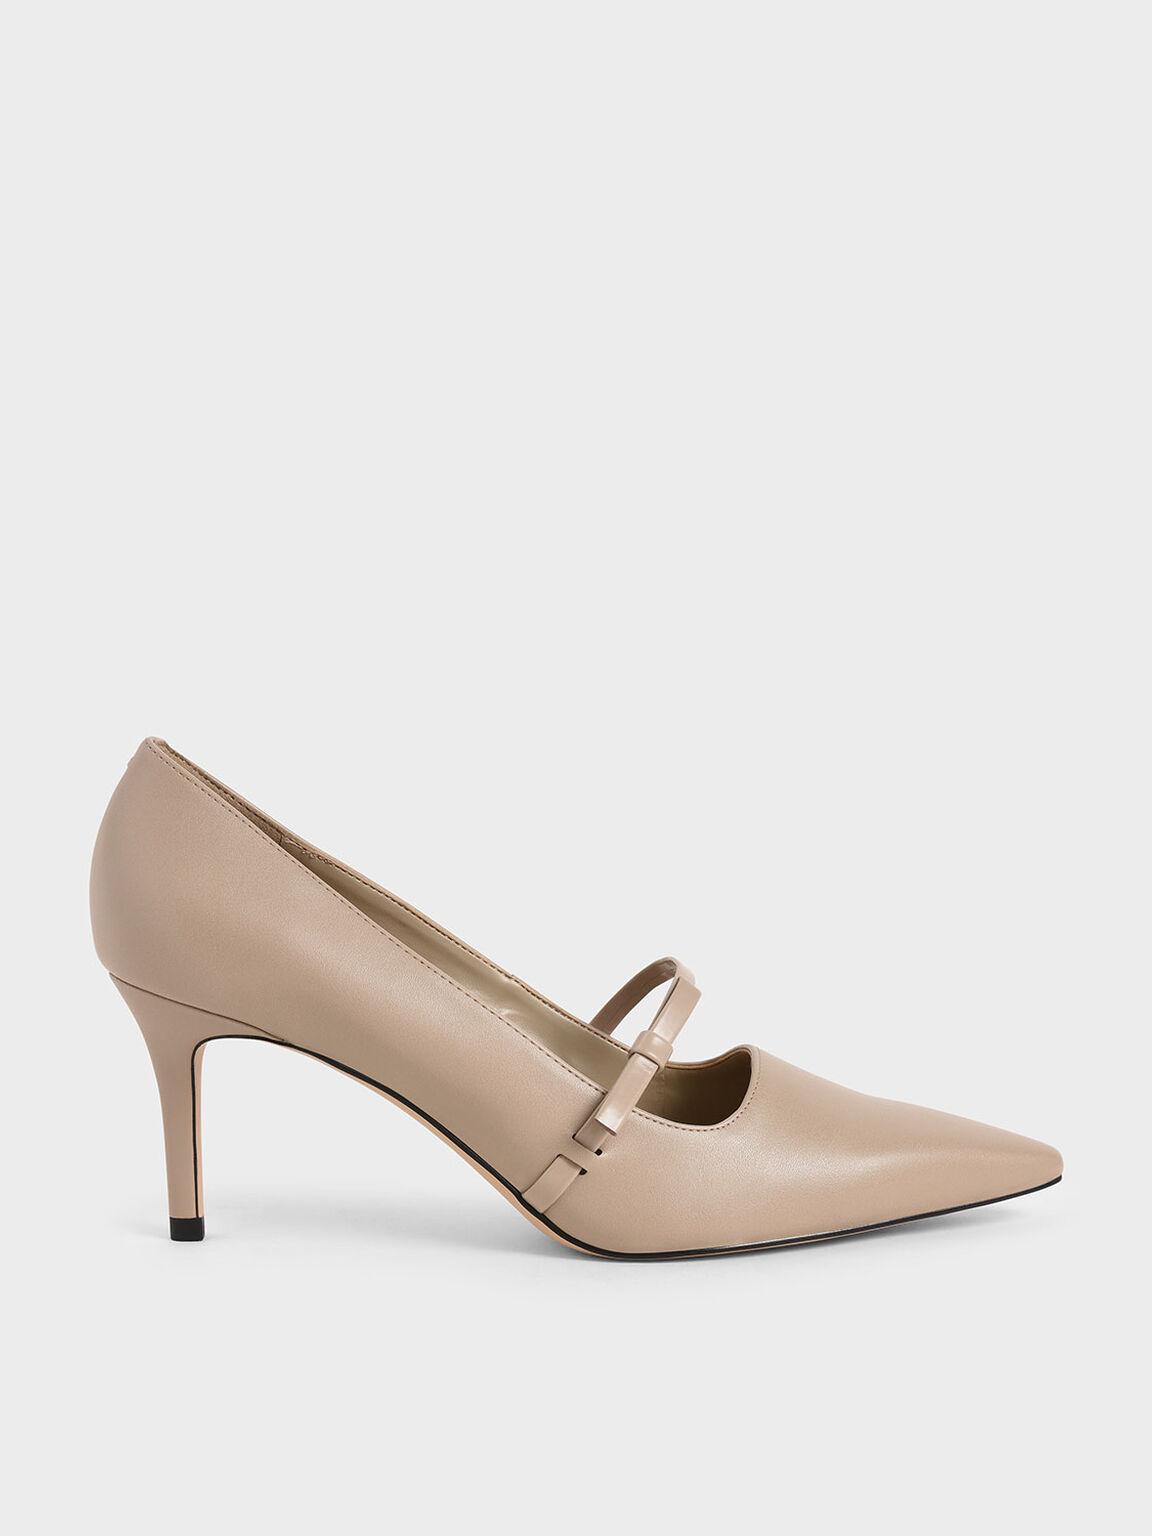 Mary Jane Stiletto Heel Court Shoes, Beige, hi-res